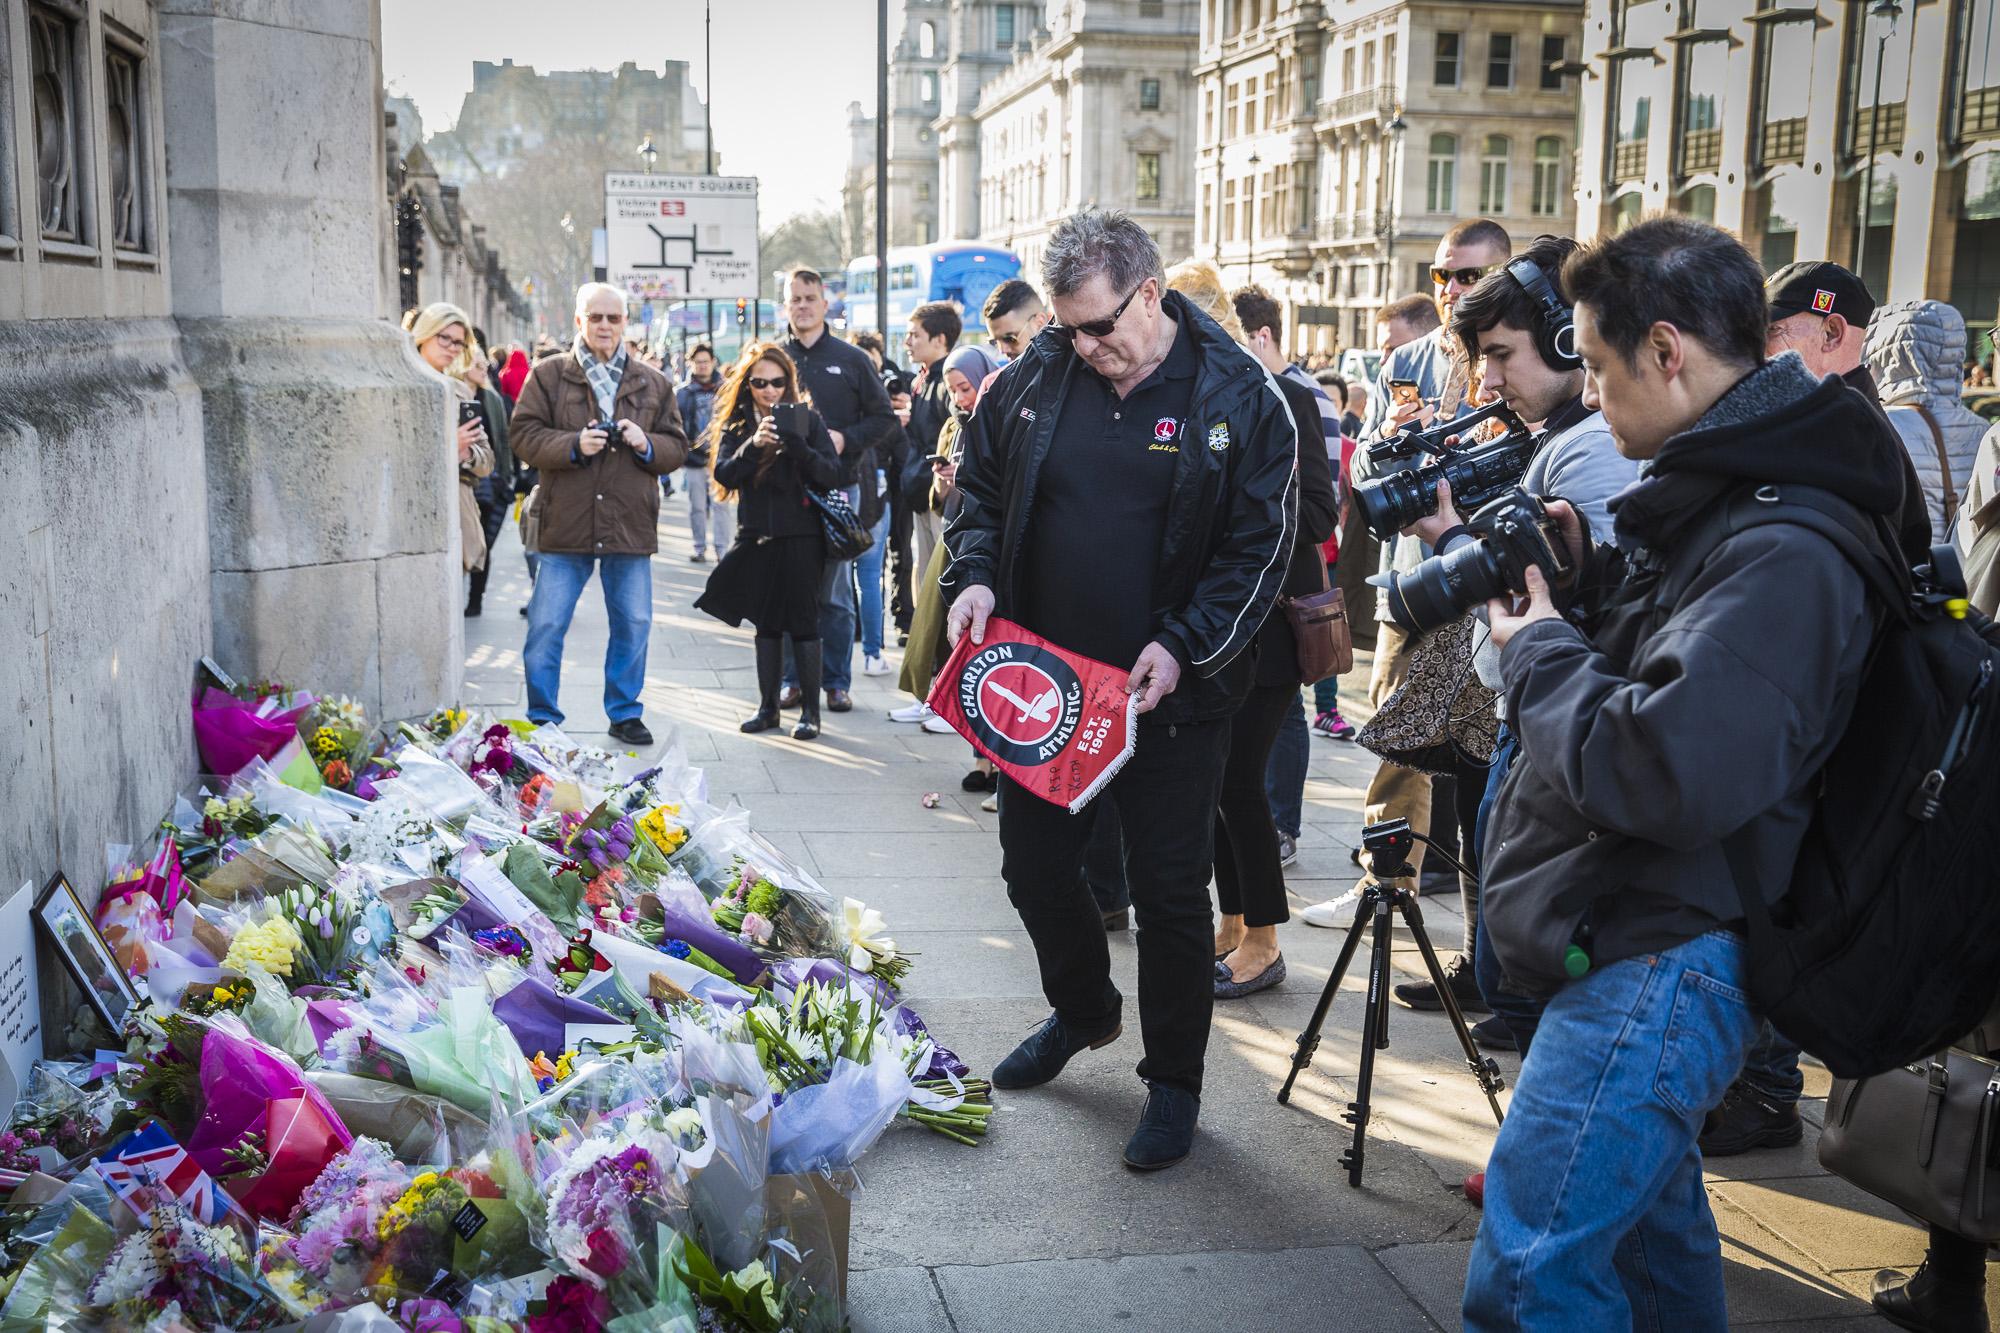 London_Attack_Hope_Not_Hate-12.jpg